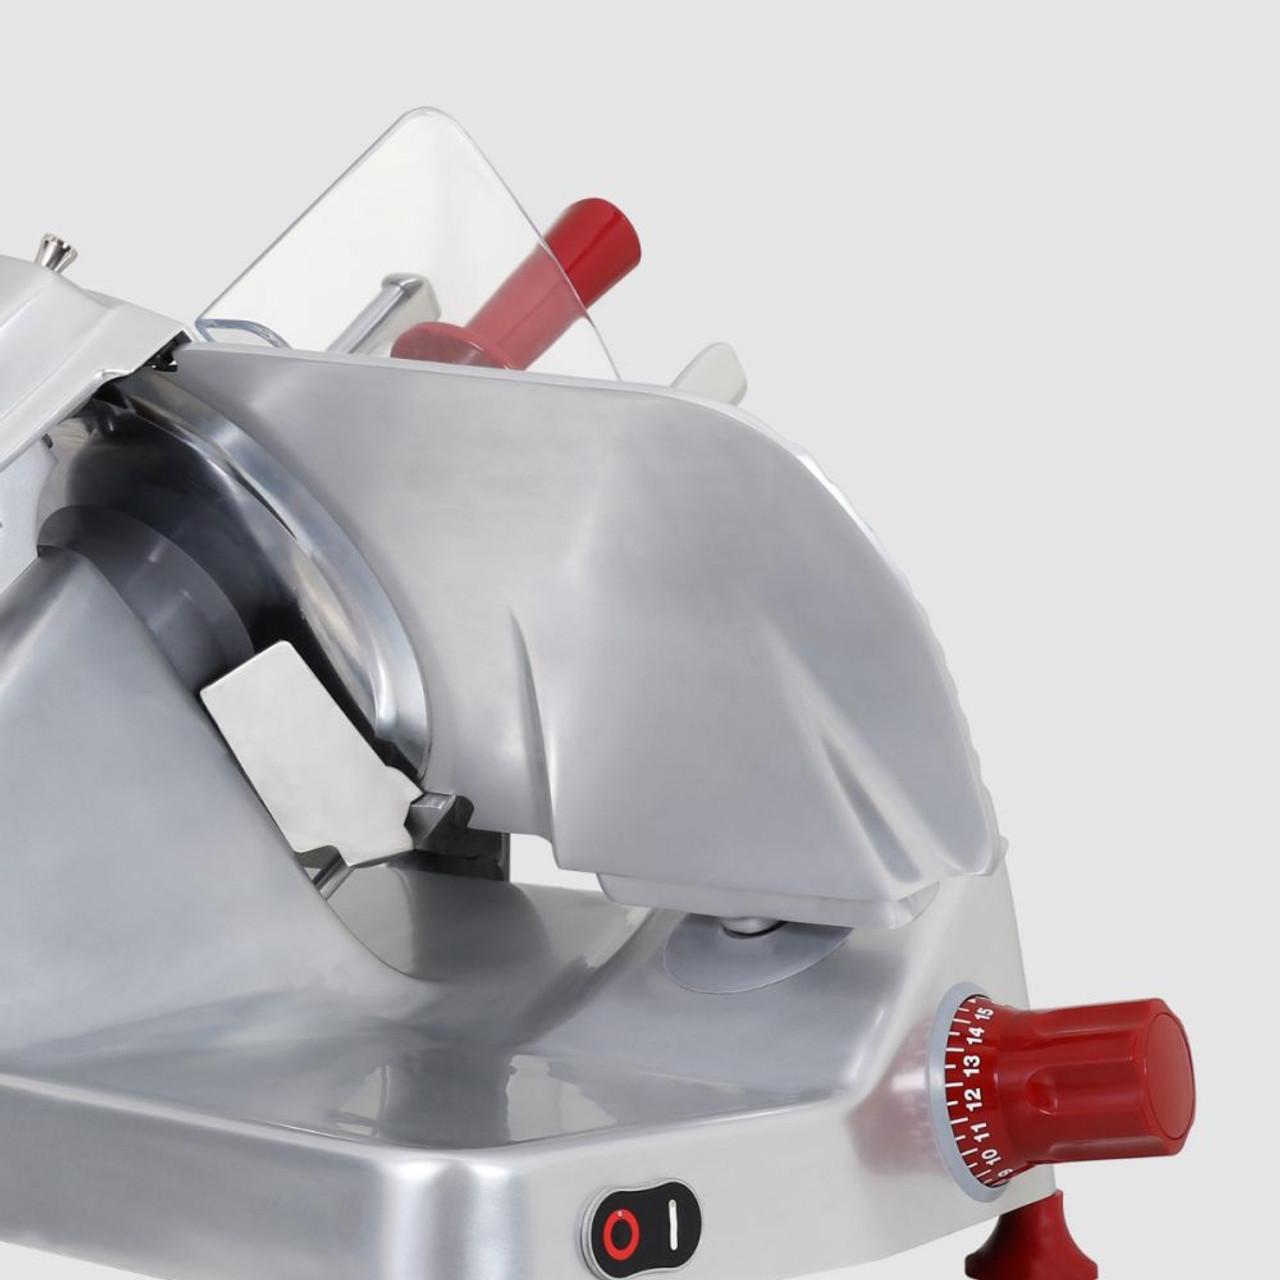 Berkel Pro Line XS25 Ham / Bacon Slicer Features